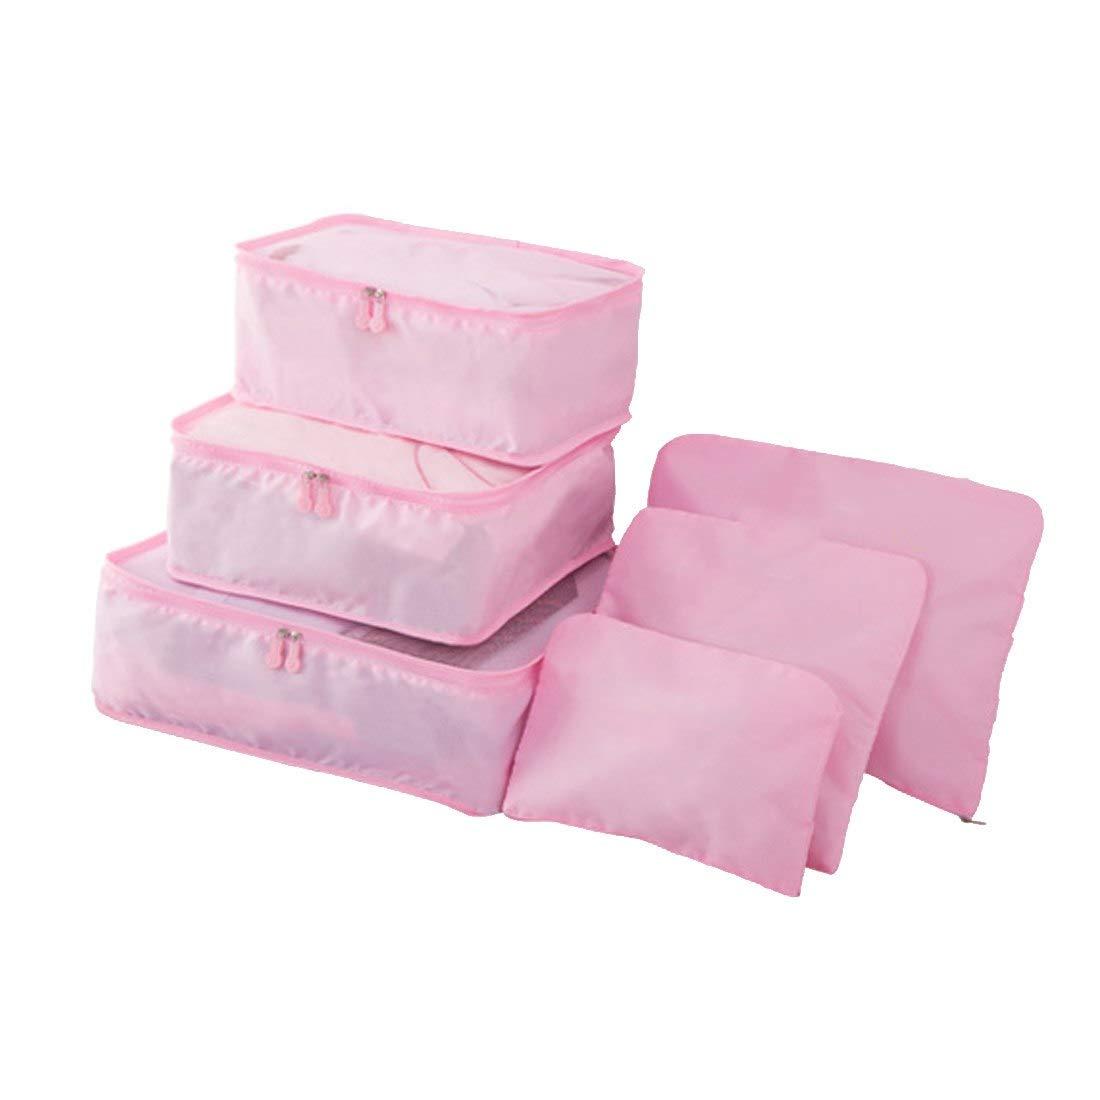 34eb9f9c1e5b Amazon.com : Saasiiyo 6 Pcs/Set Korean Style Travel Home Luggage ...